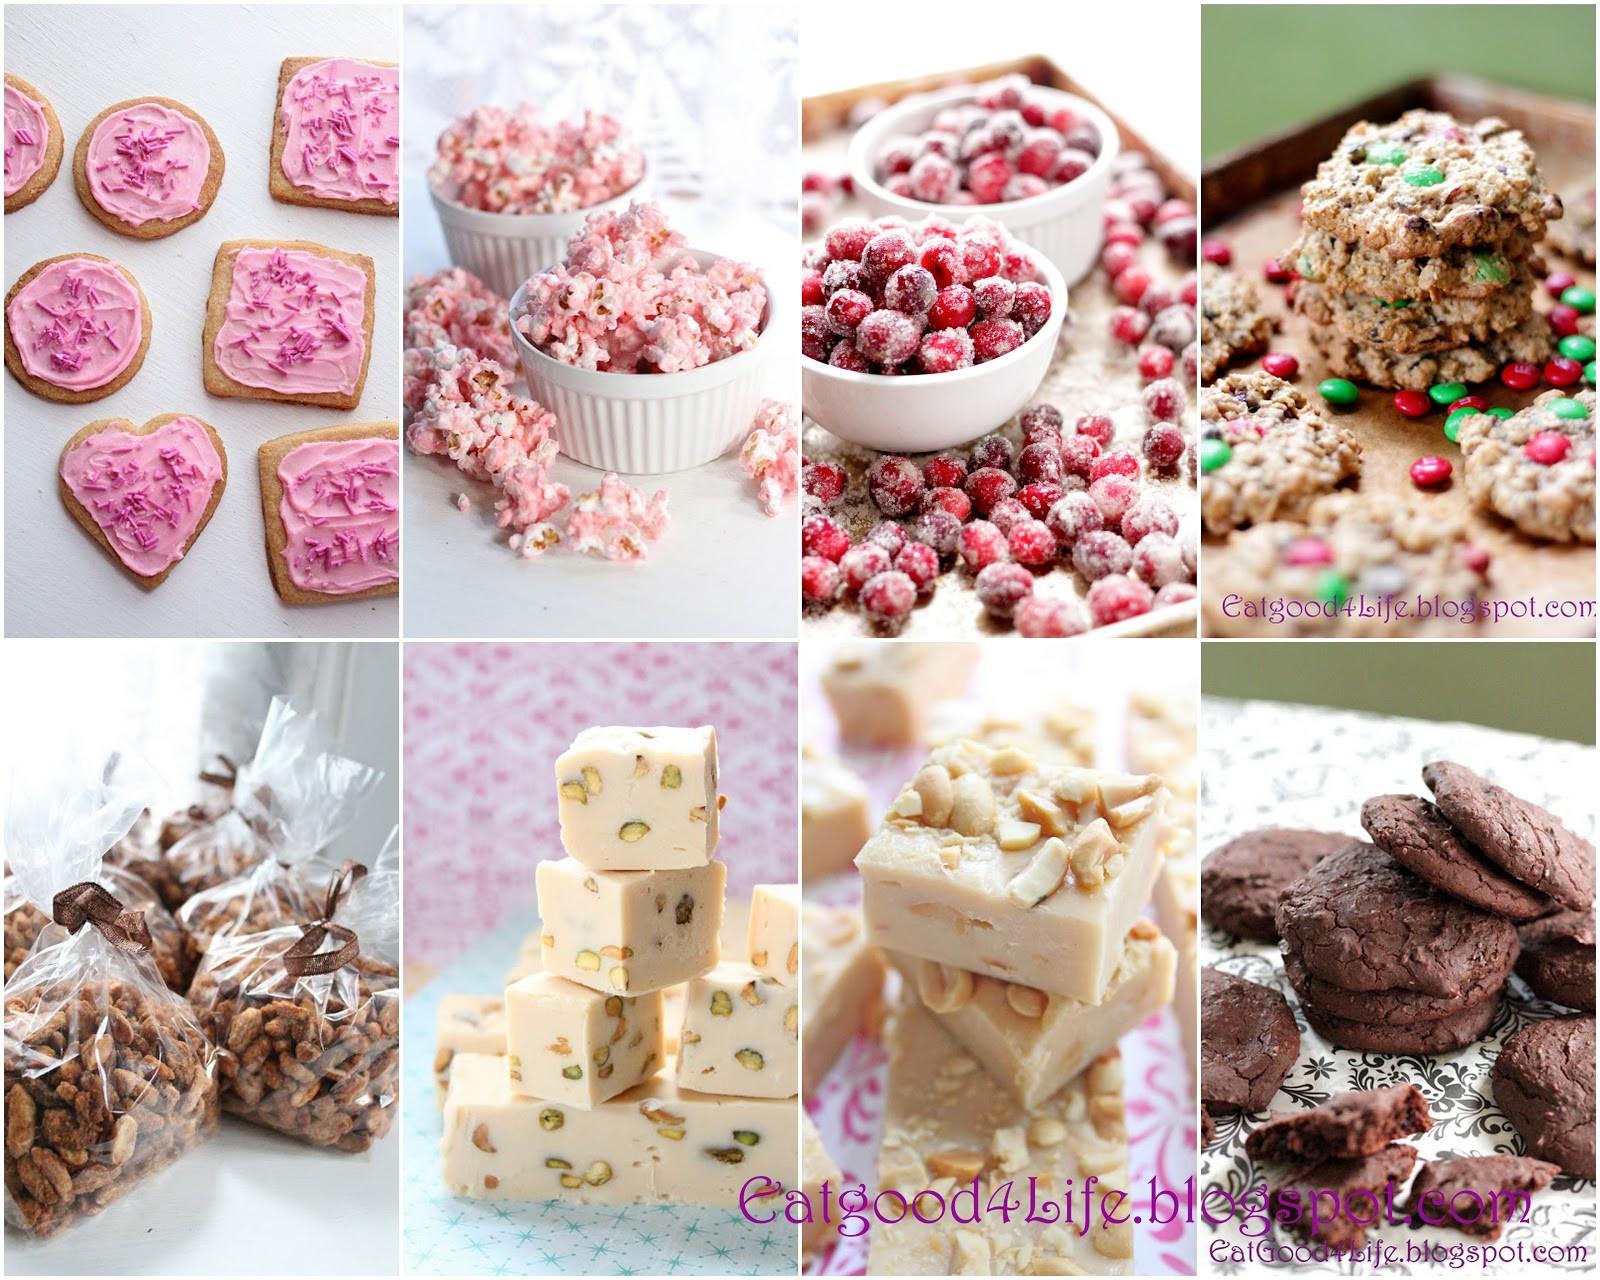 Christmas Baking Ideas  My Top 16 Christmas t baking ideas